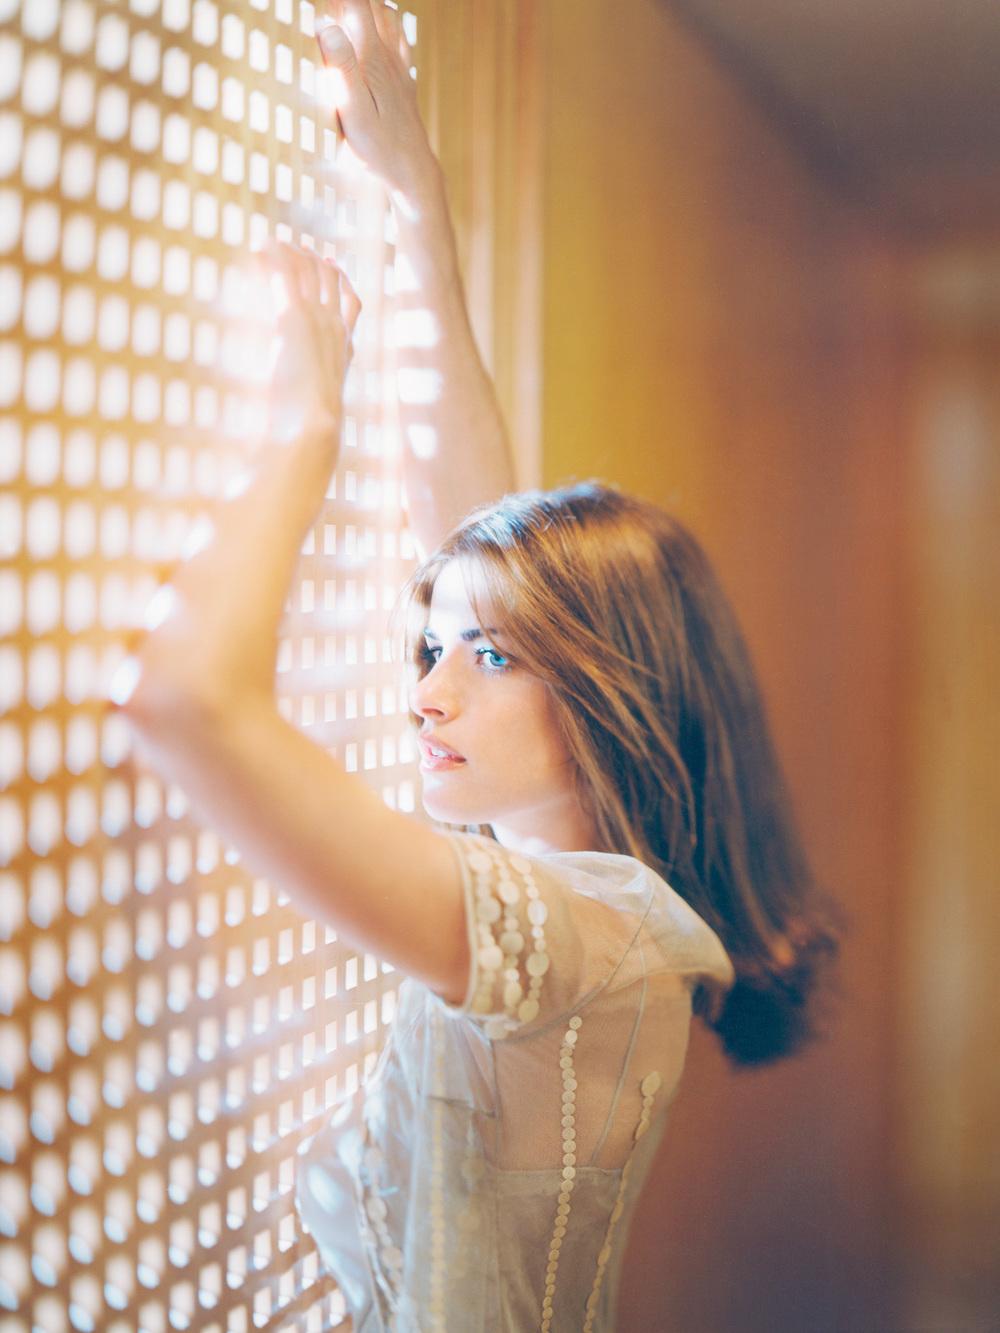 Amanda Peet photographed by Patrik Andersson